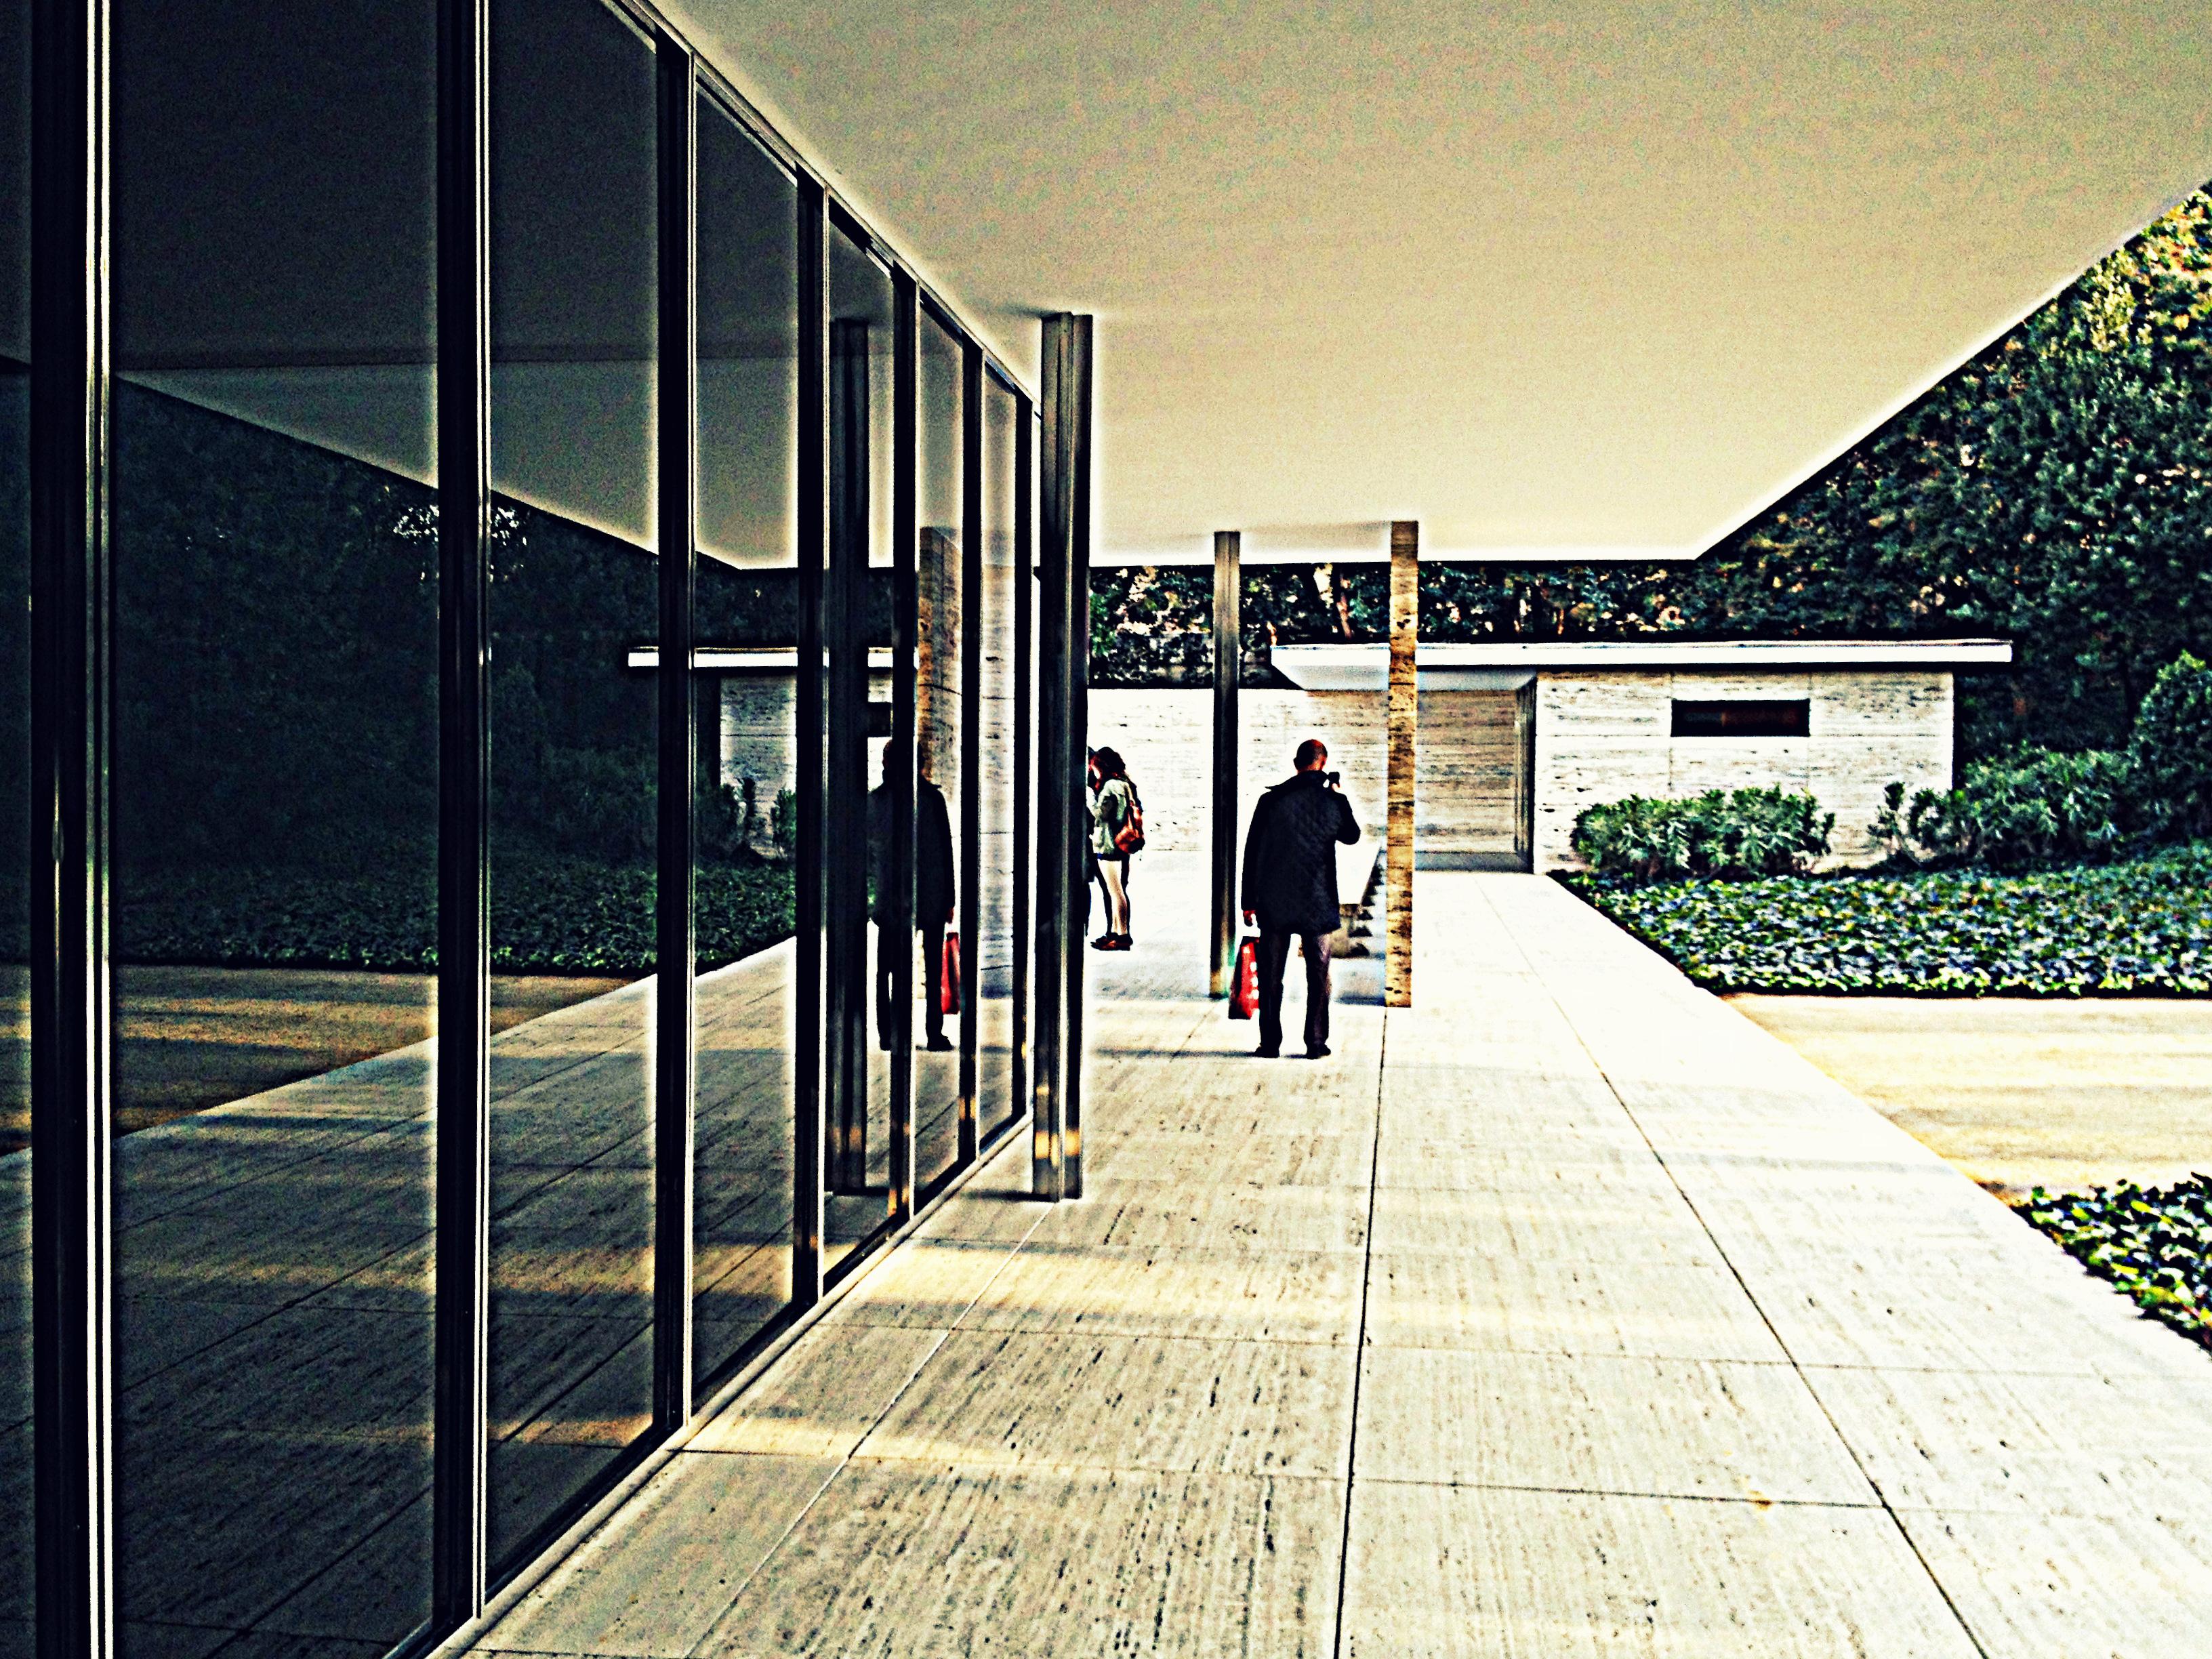 Mies van der rohe s bauhaus style building in barcelona for Mies van der rohe barcelona